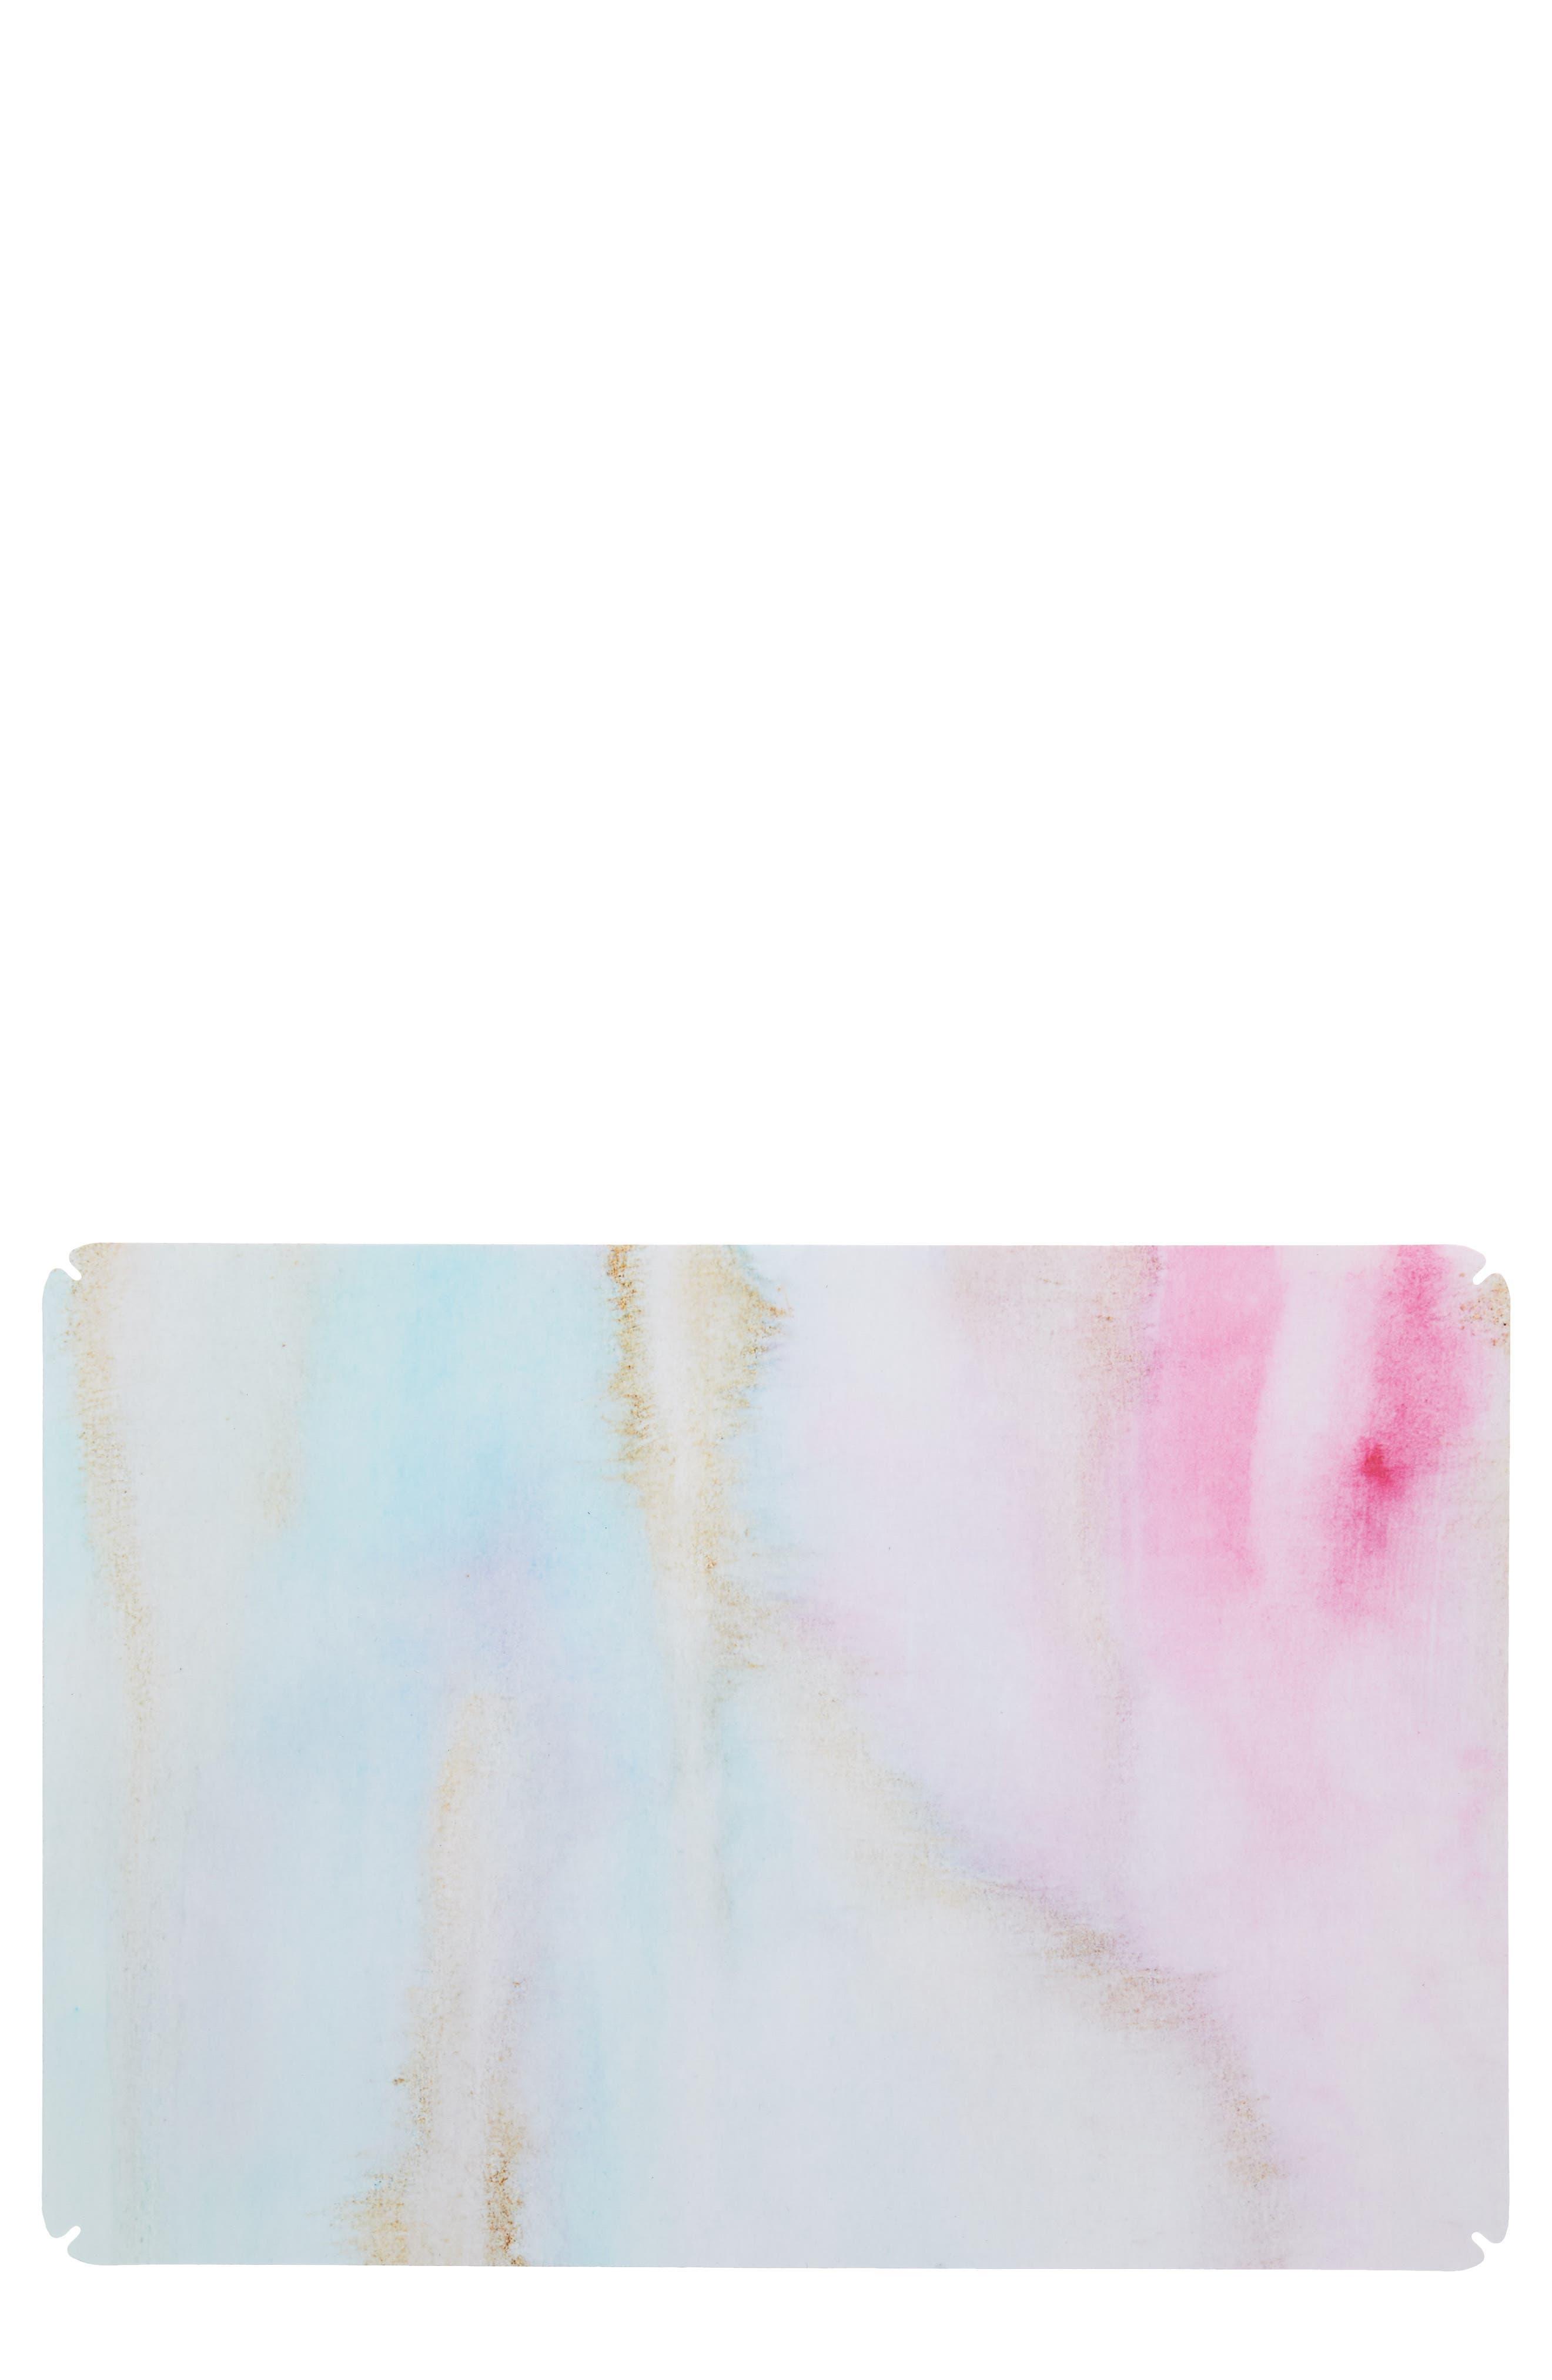 Watercolor Marble 13-Inch Macbook Skin,                             Main thumbnail 1, color,                             650